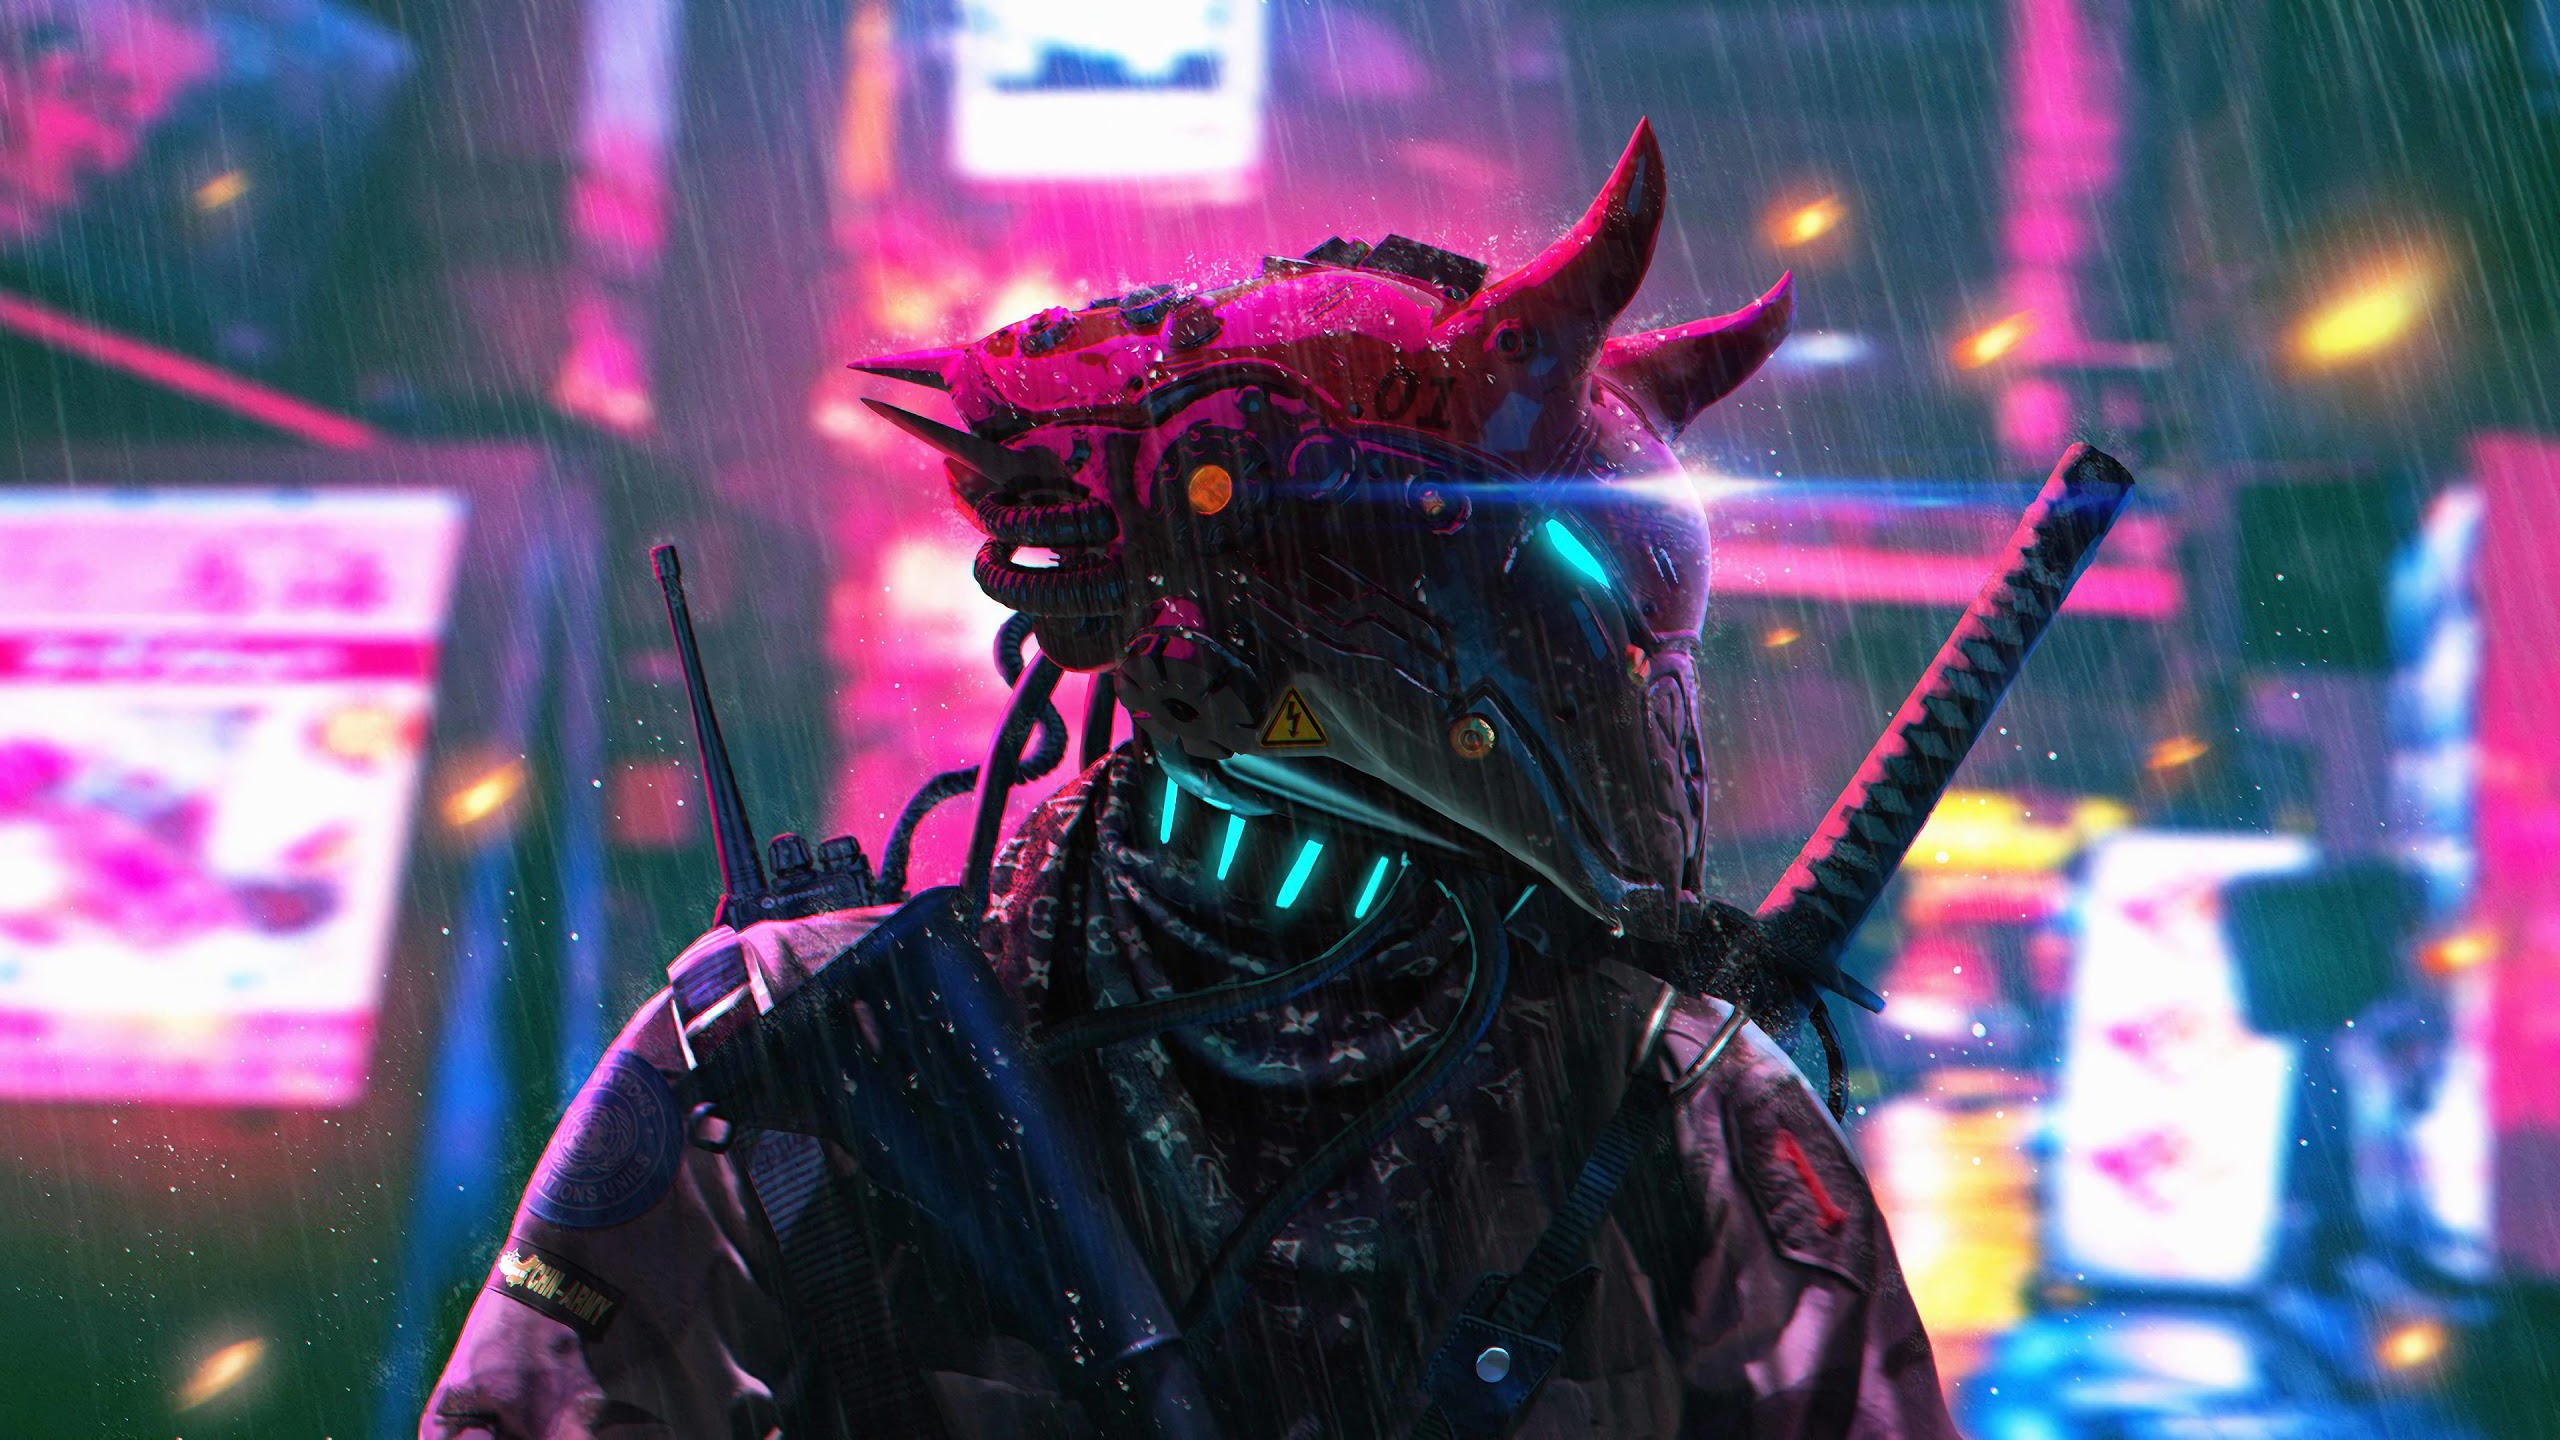 Cyberpunk Wallpaper 4k Posted By Samantha Johnson